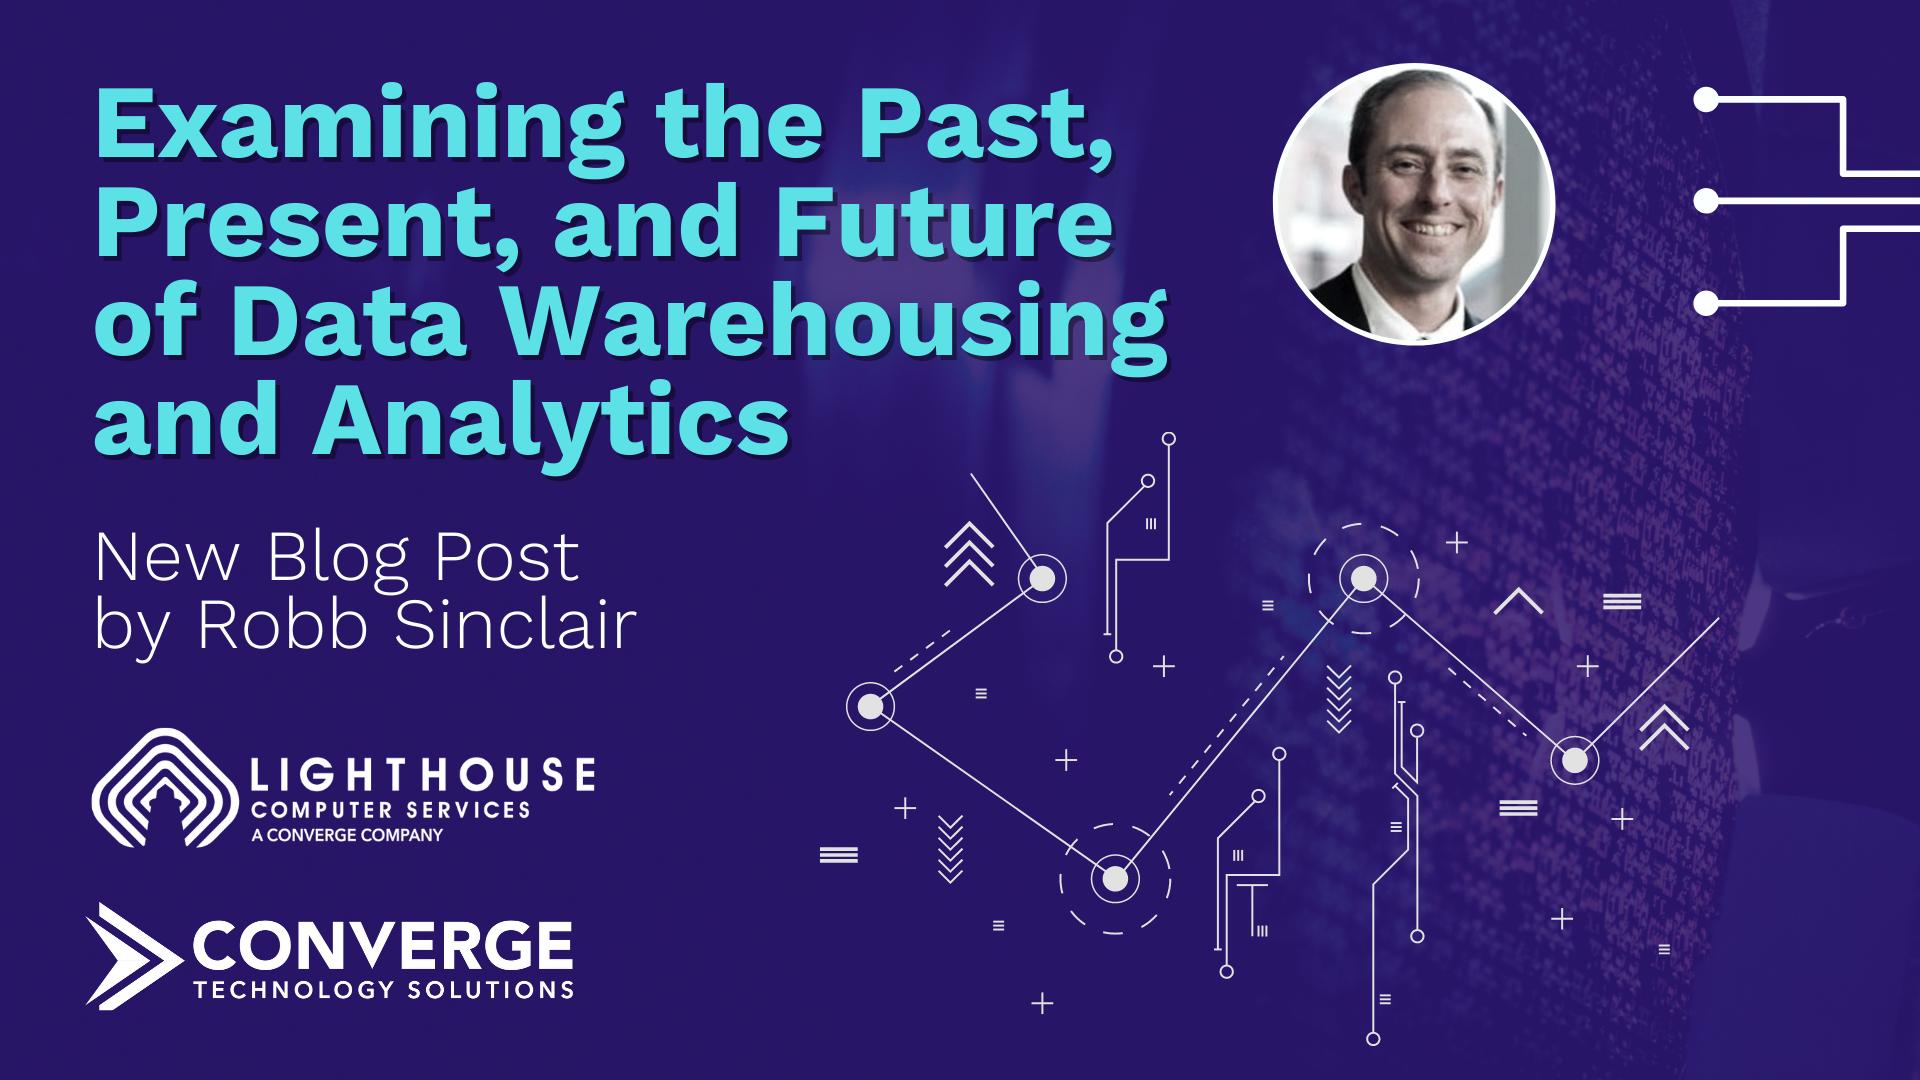 Examining the Past, Present, and Future of Data Warehousing and Analytics